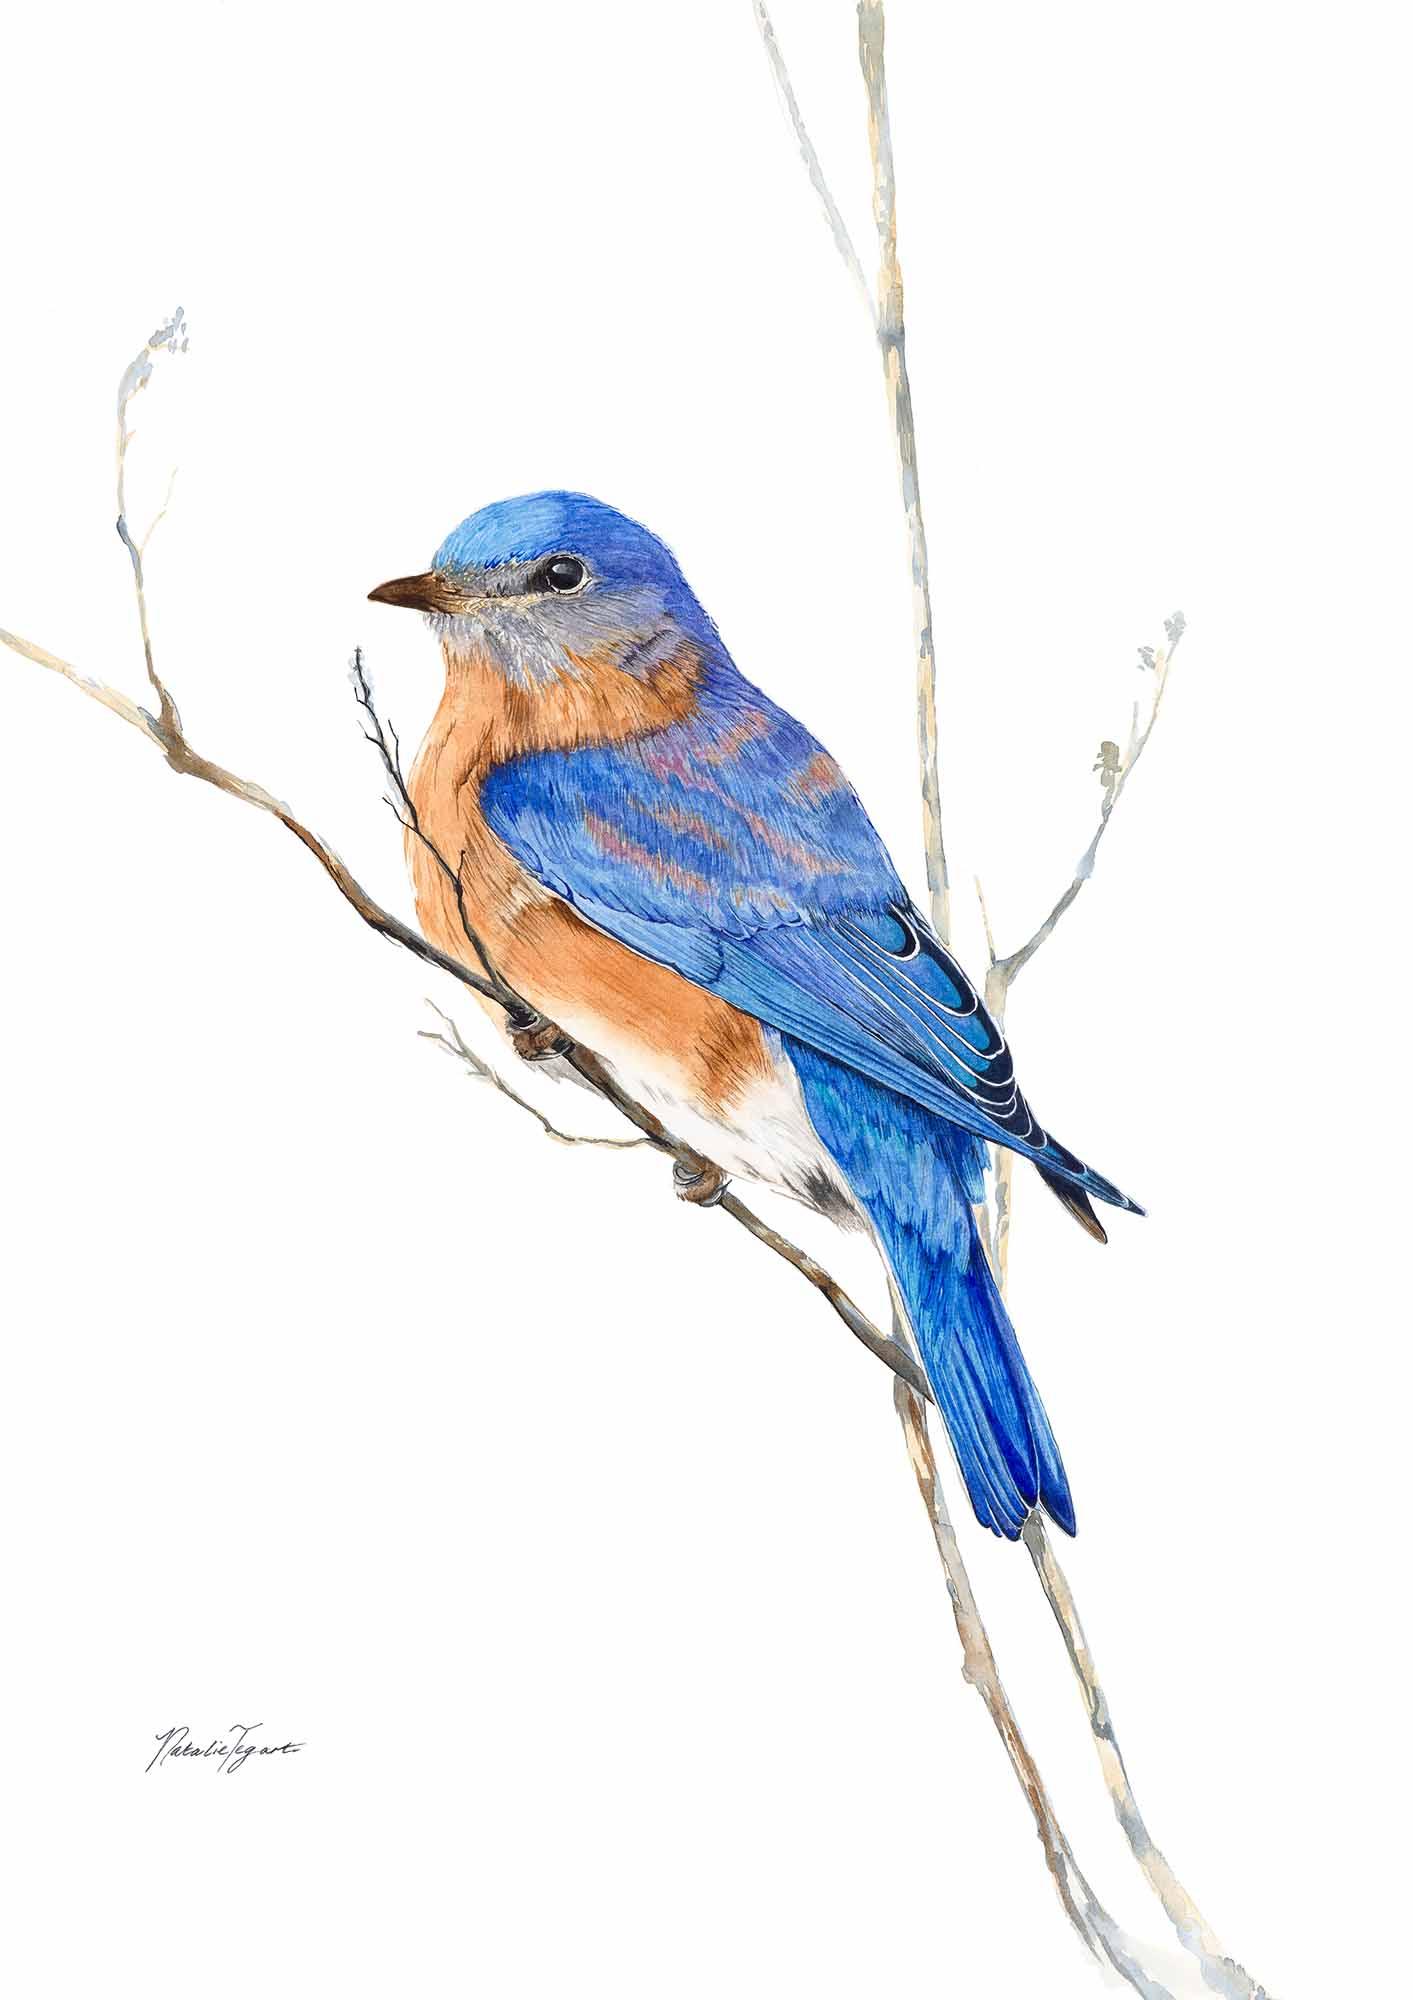 Natalie tegart 001 missouri the eastern bluebird 2000px jbvihc